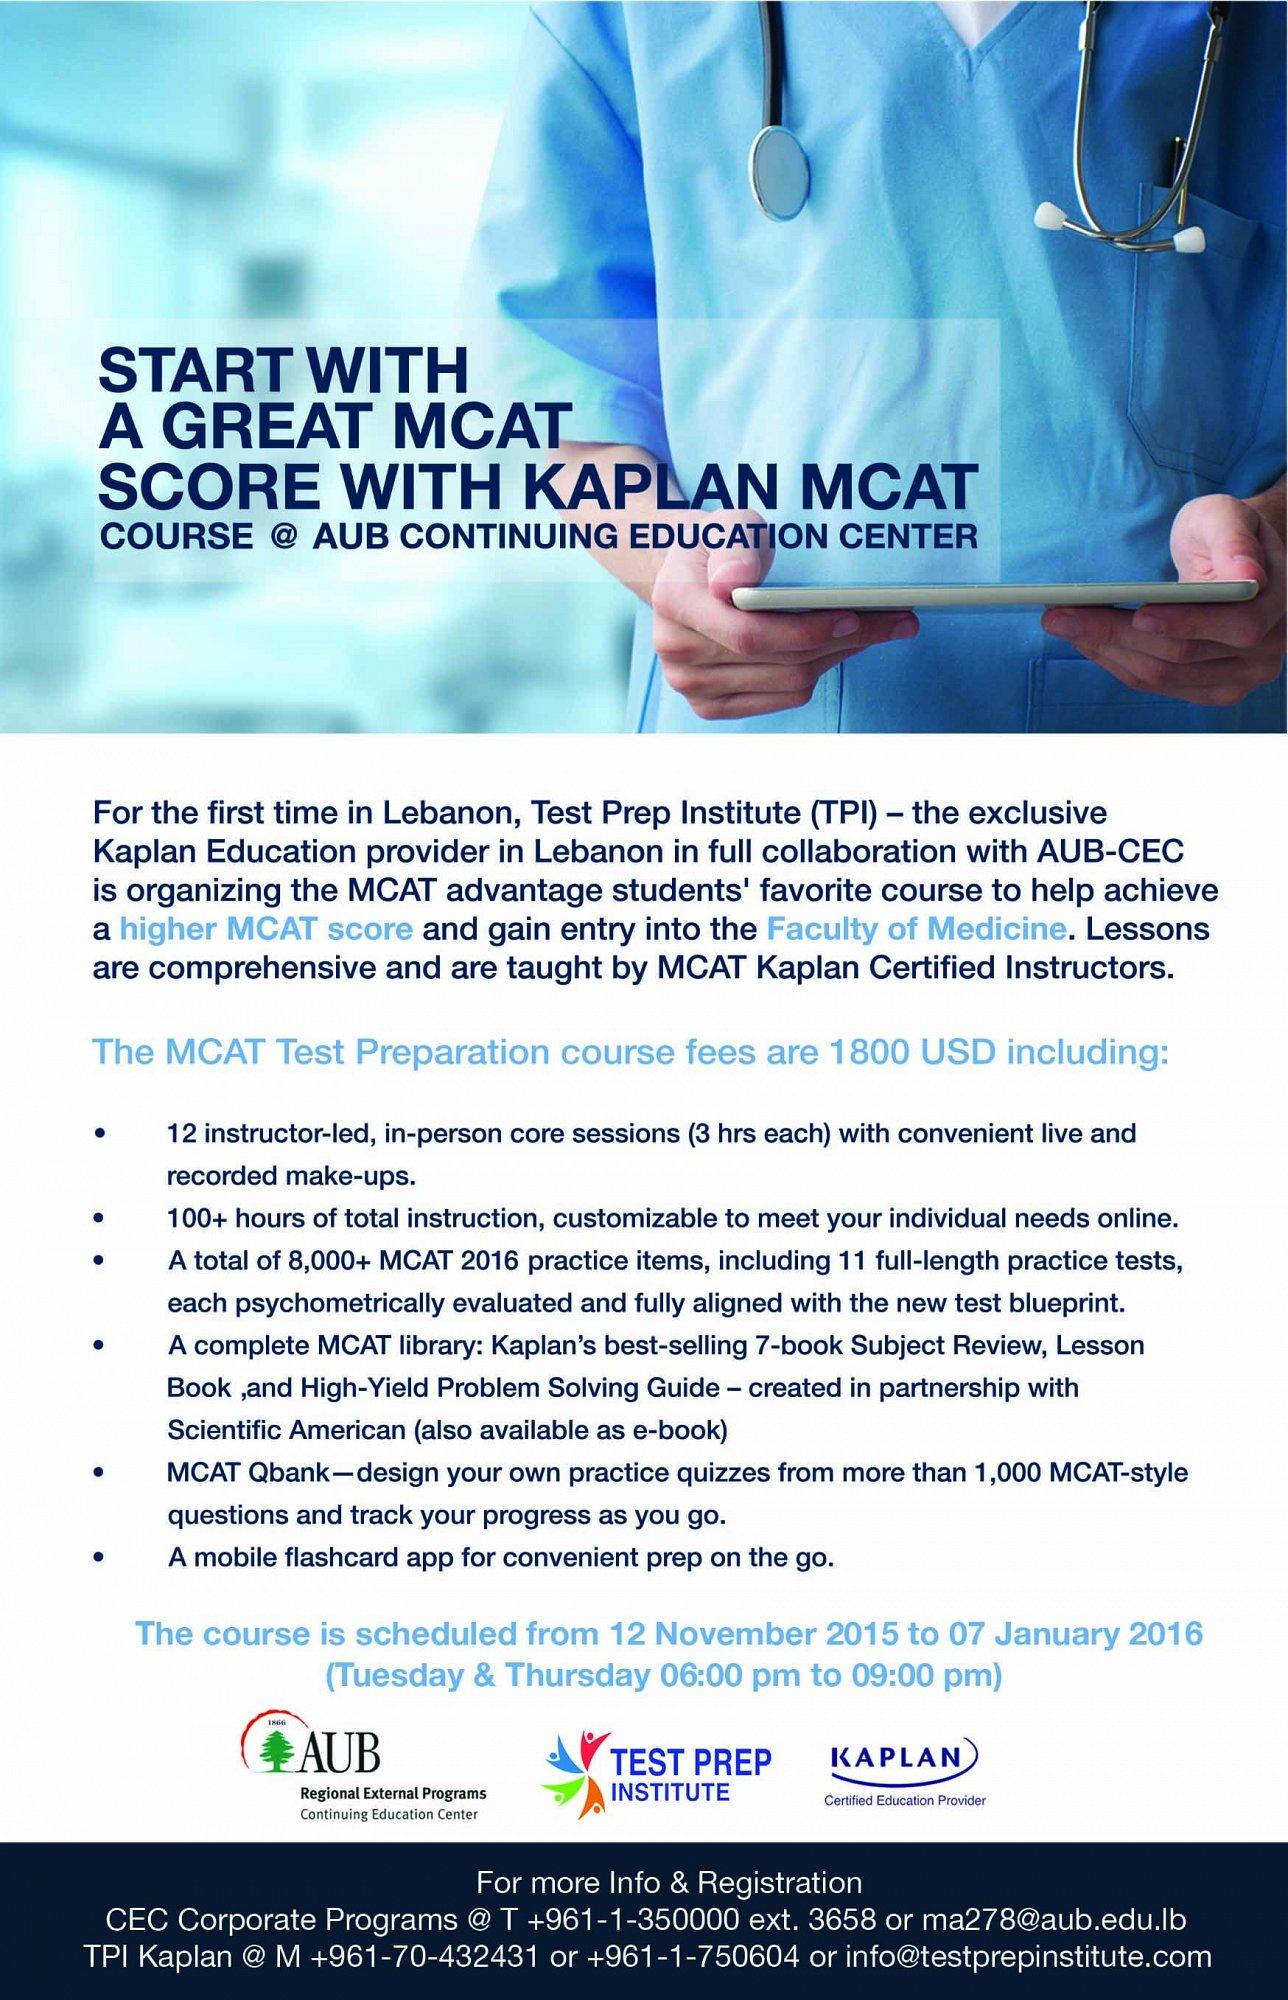 MCAT® Kaplan course @ AUB CEC « Lebtivity